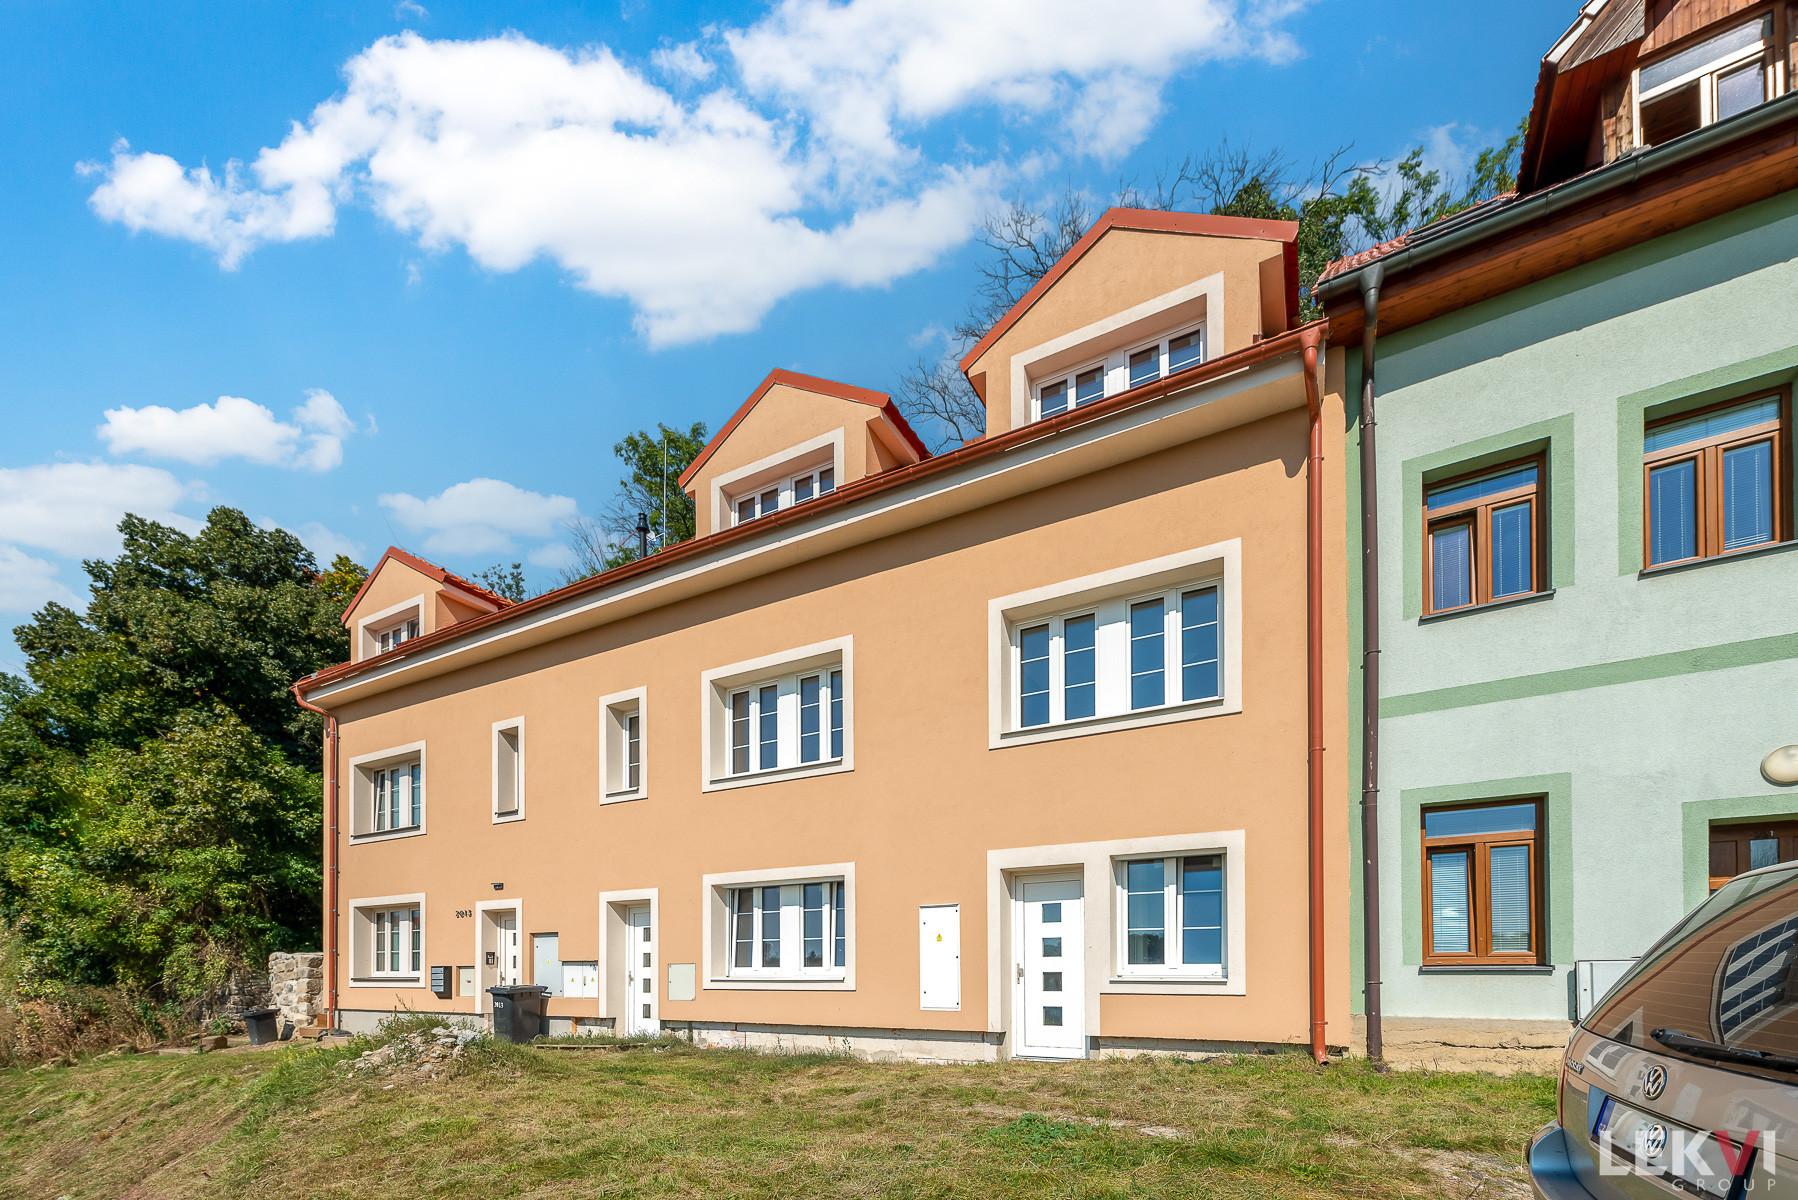 Prodej bytu 3+kk, 68 m2 - Pod Horou, Kladno